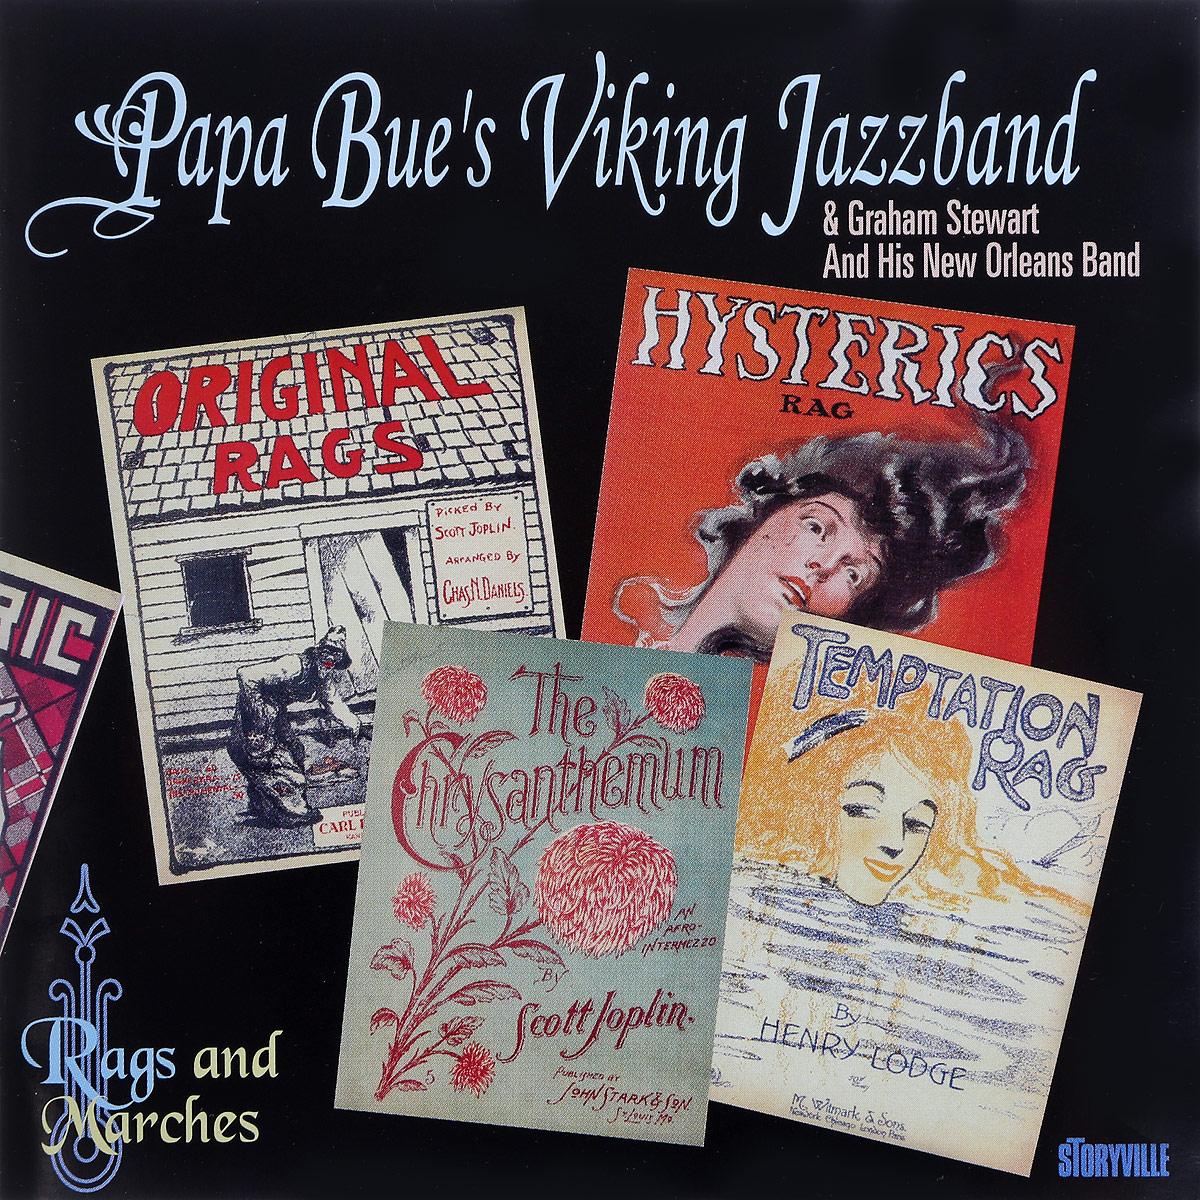 Papa Bue's Viking Jazz Band,Graham Stewart And His New Orleans Band Papa Bue's Viking Jazz Band & Graham Stewart And His New Orleans Band. Rags And Marches цена и фото